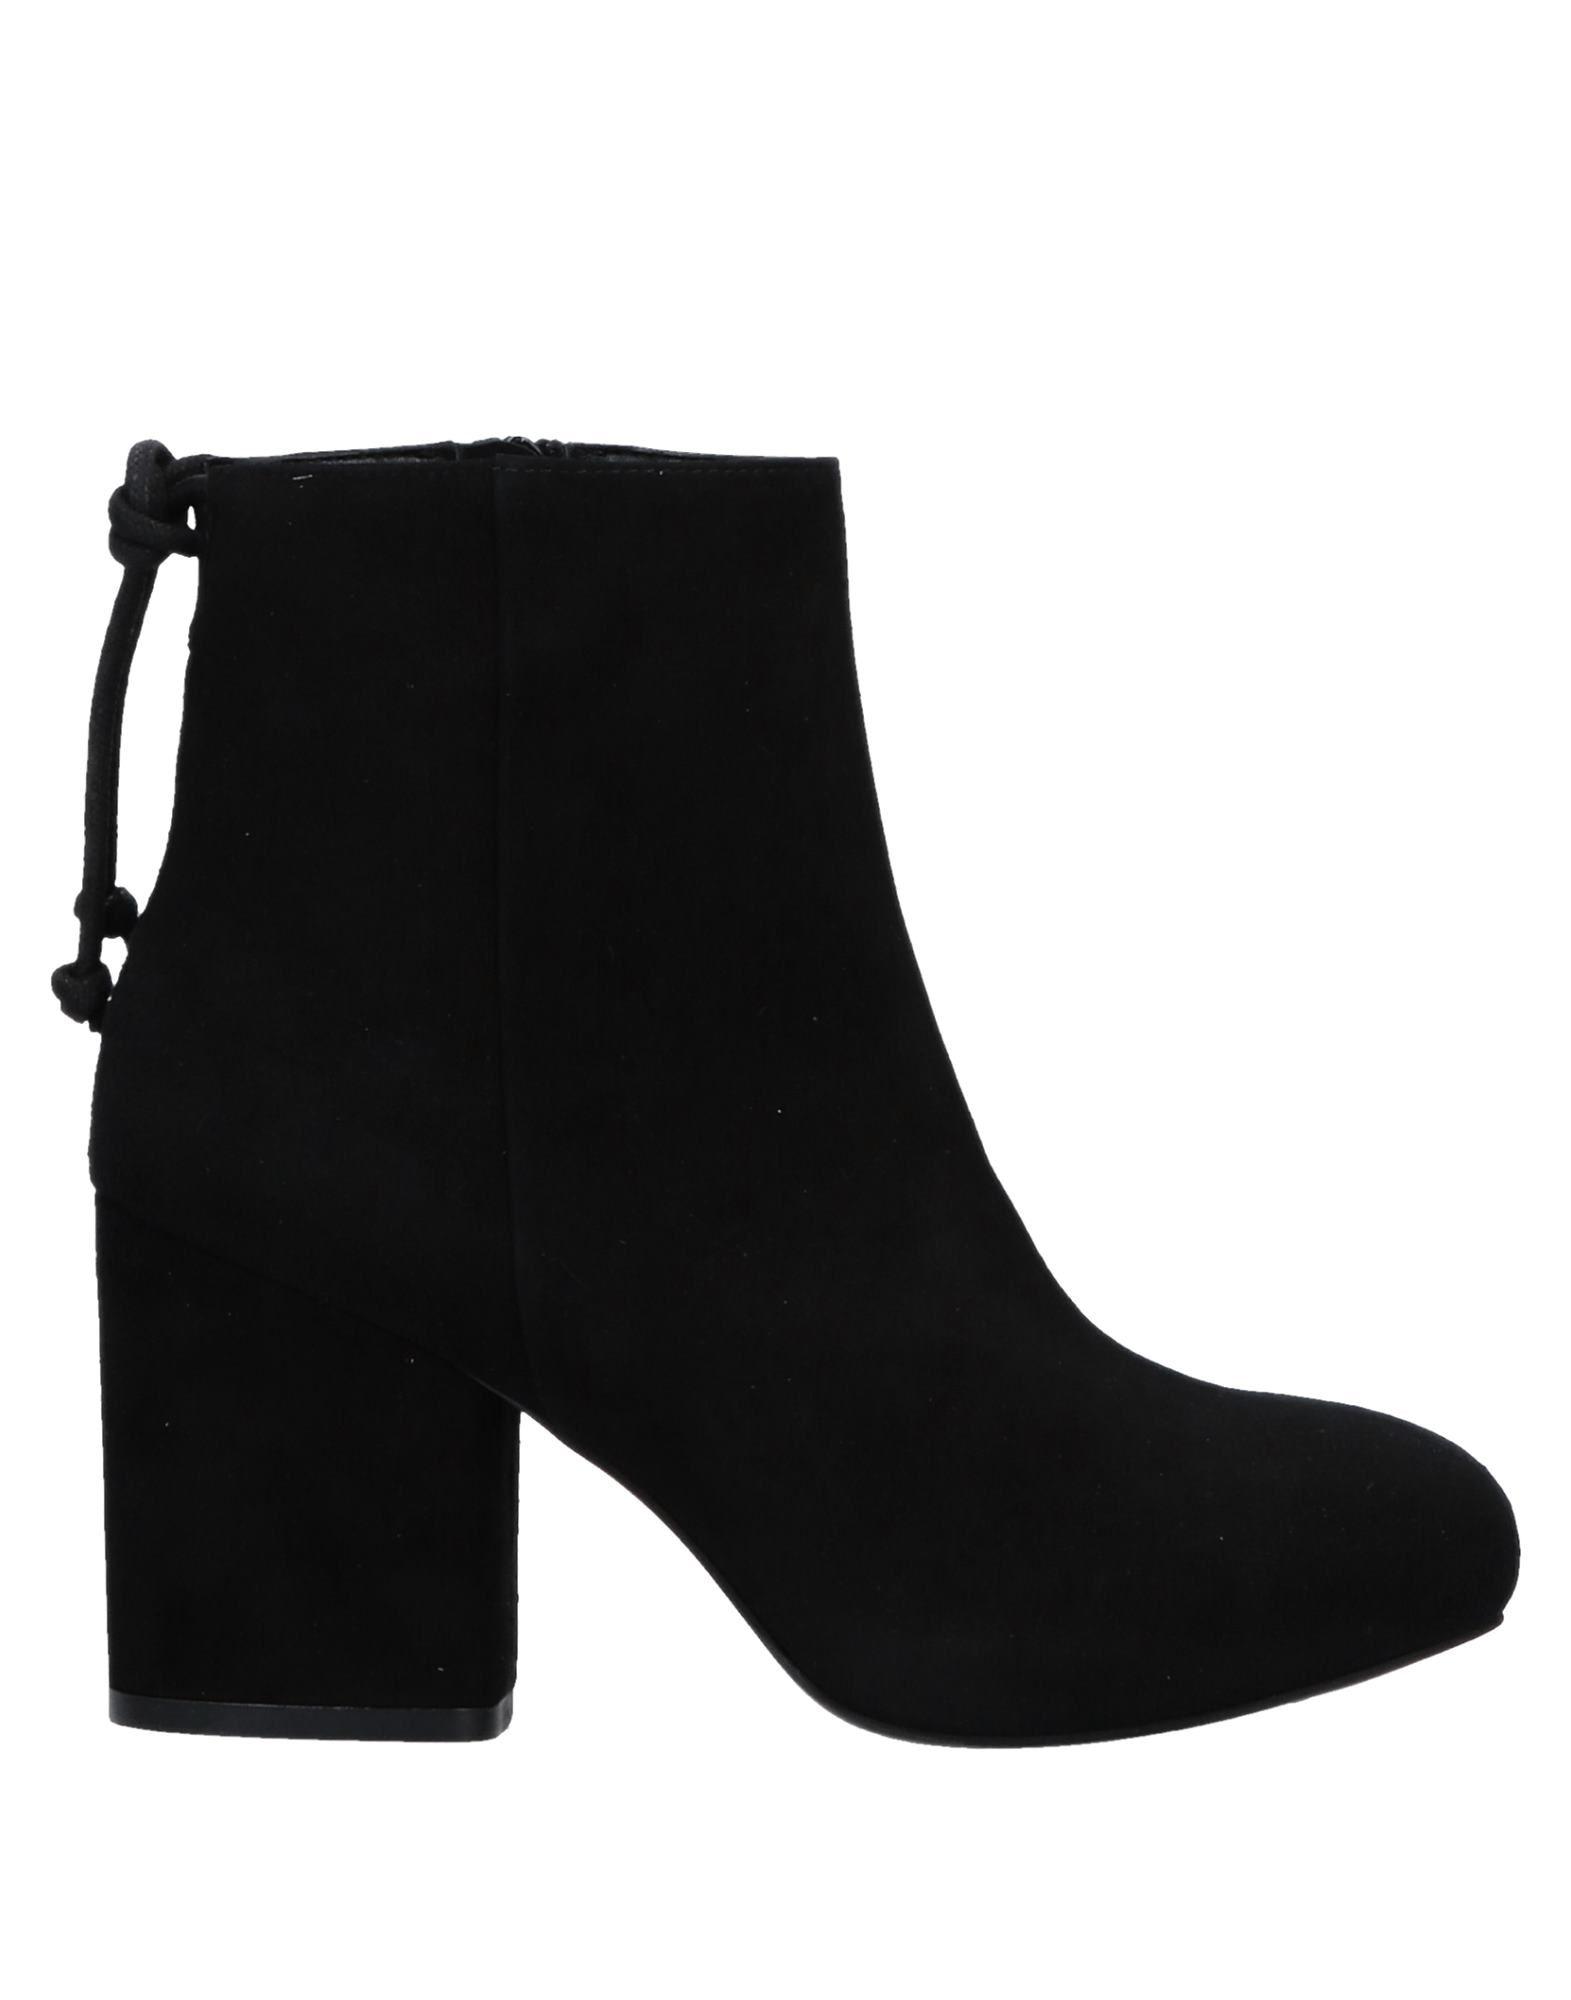 Stilvolle Silvia billige Schuhe Silvia Stilvolle Rossini Stiefelette Damen  11538881CN 65ad1d